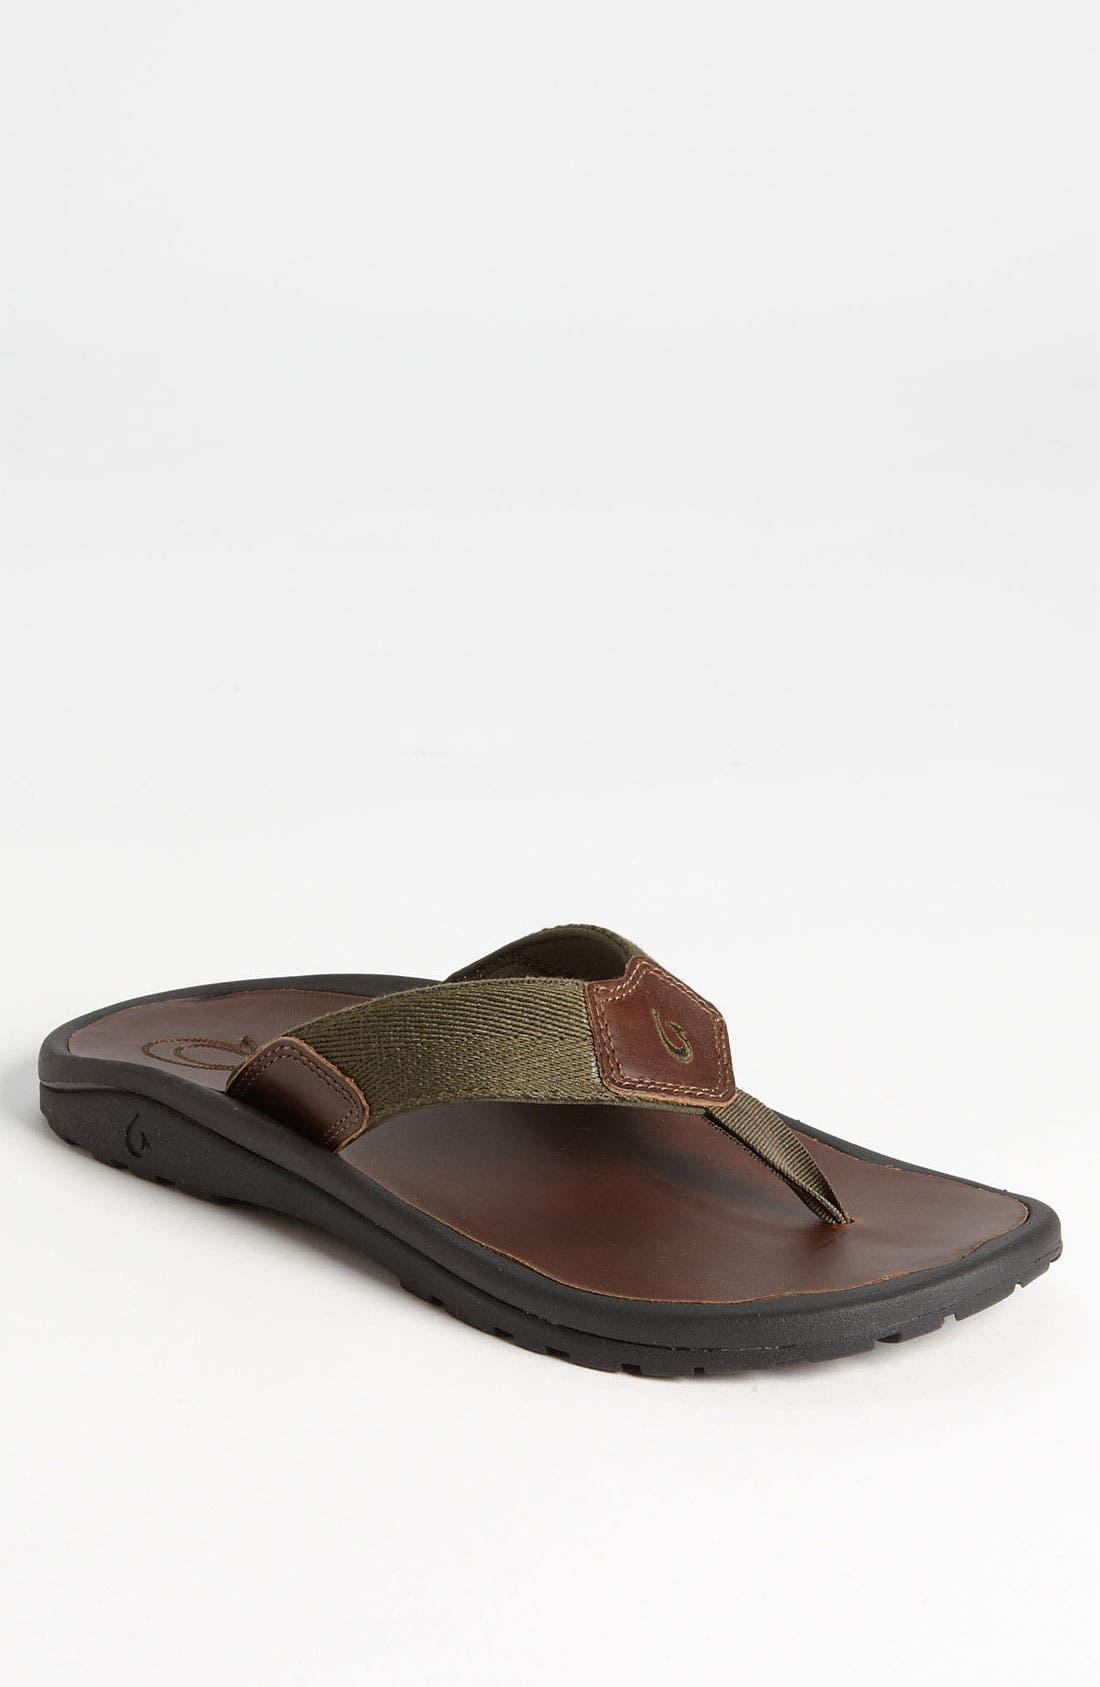 Alternate Image 1 Selected - OluKai 'Kalo' Flip Flop (Men)